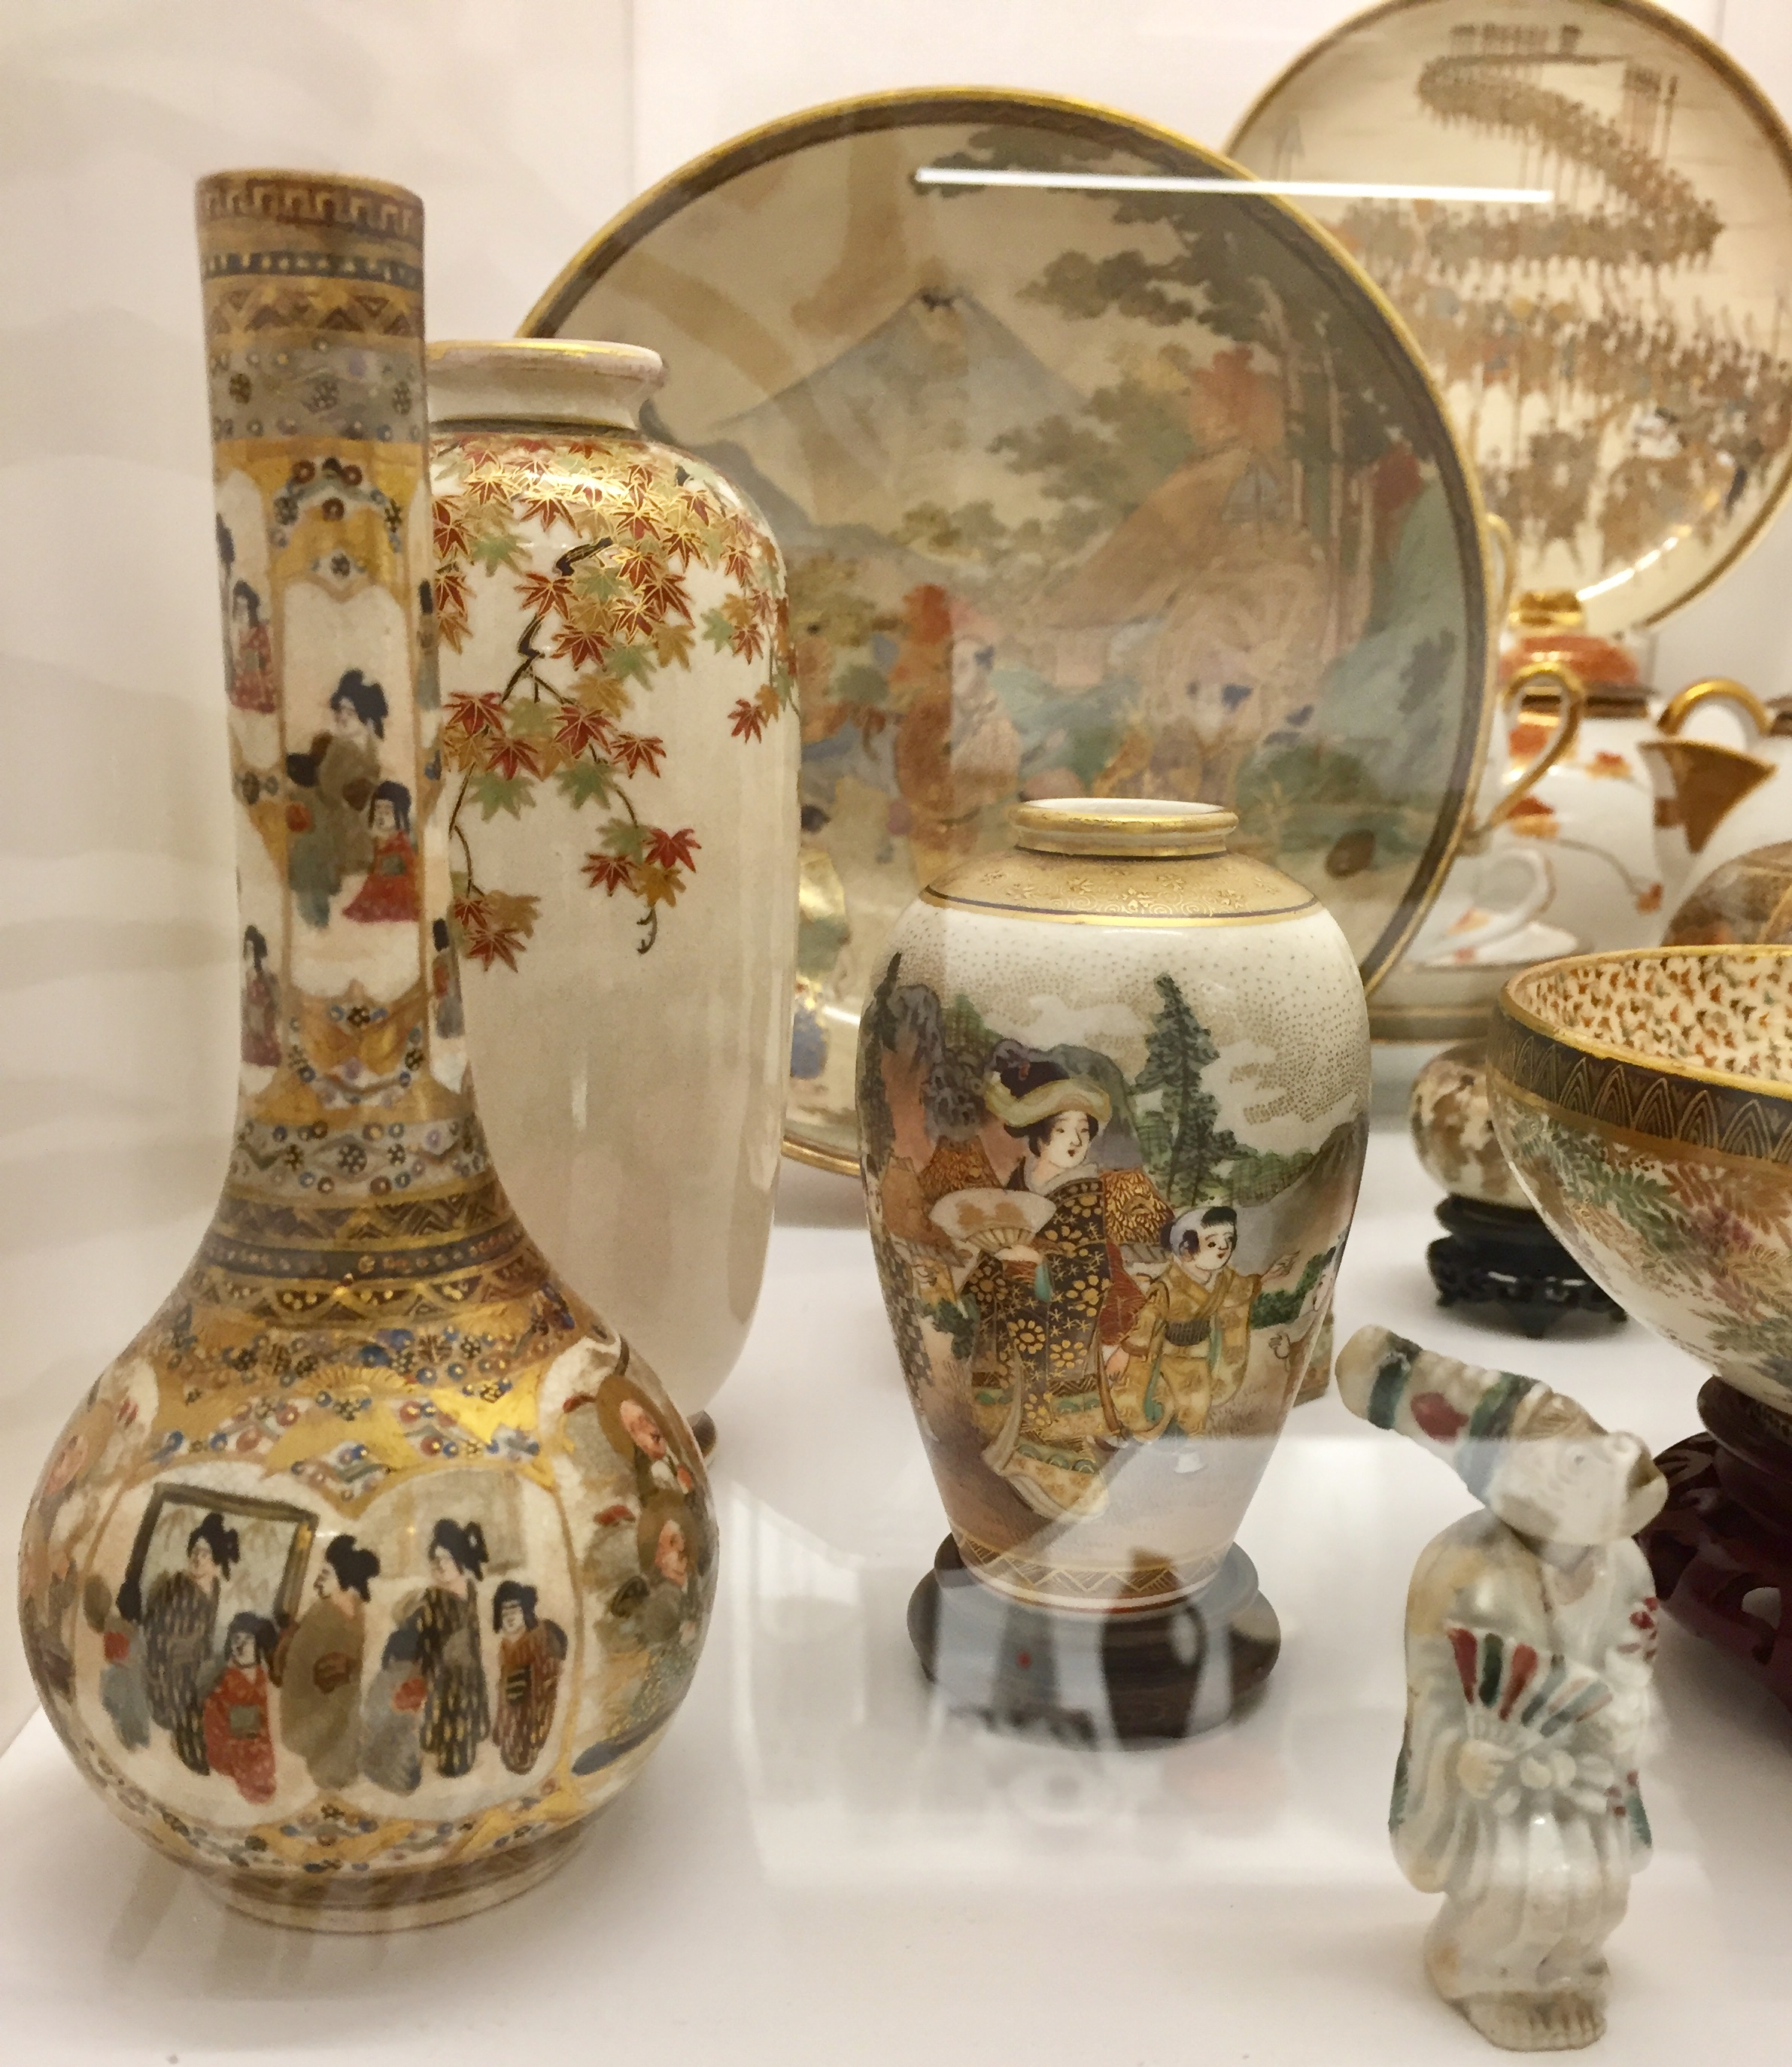 Some beautiful Japanese Satsuma Porcelain ware.